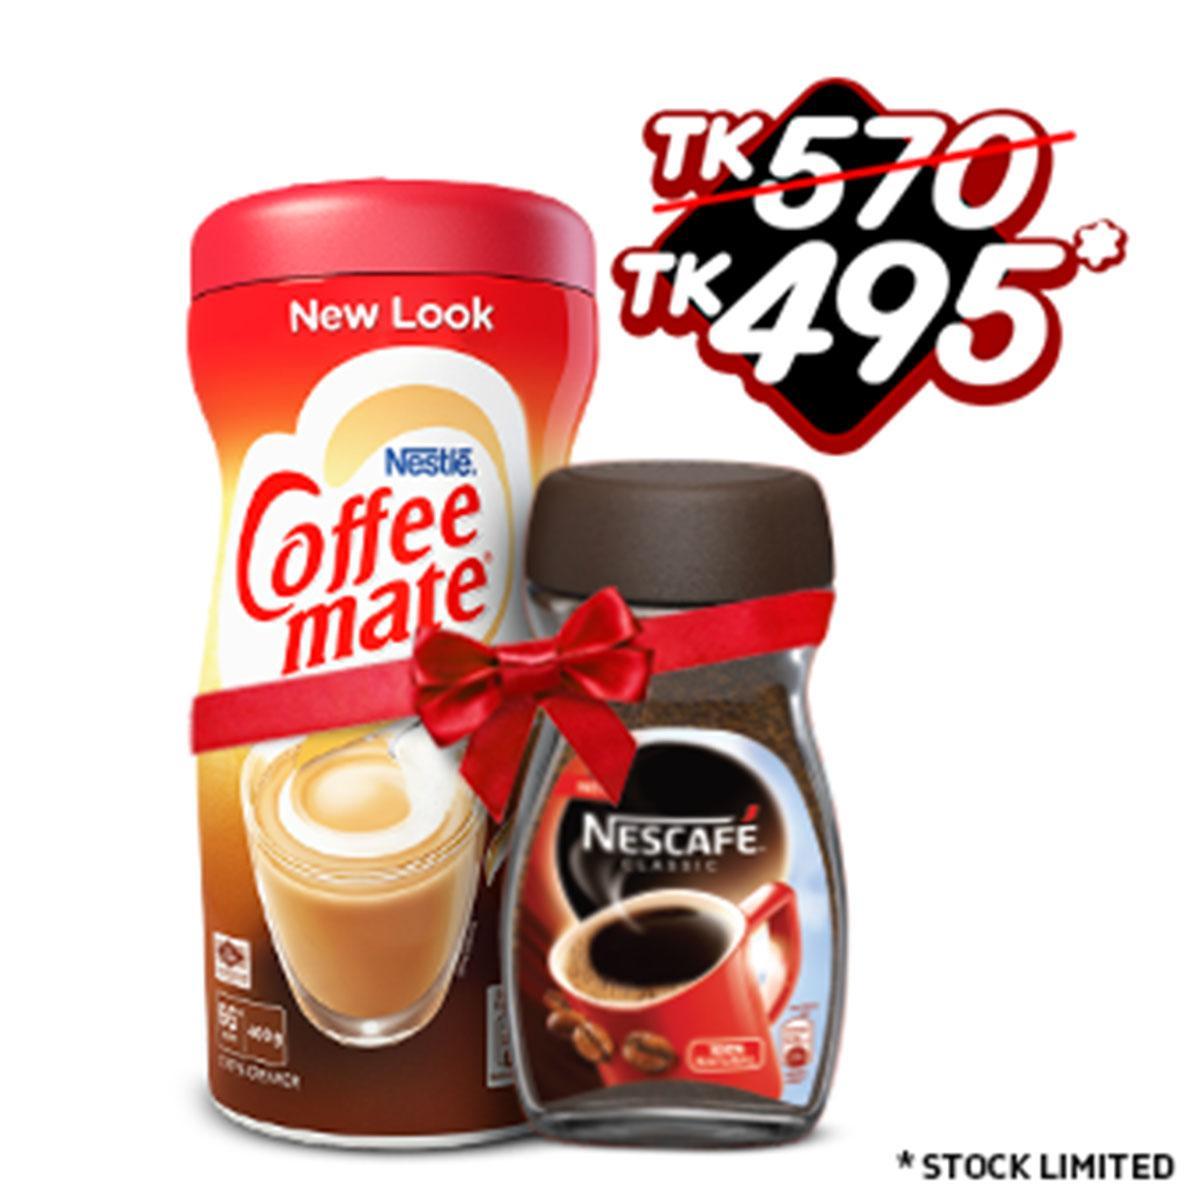 Love in the Jars Offer (Nescafe Classic 100g Jar & Nestle Coffeemate 400g Jar bundle